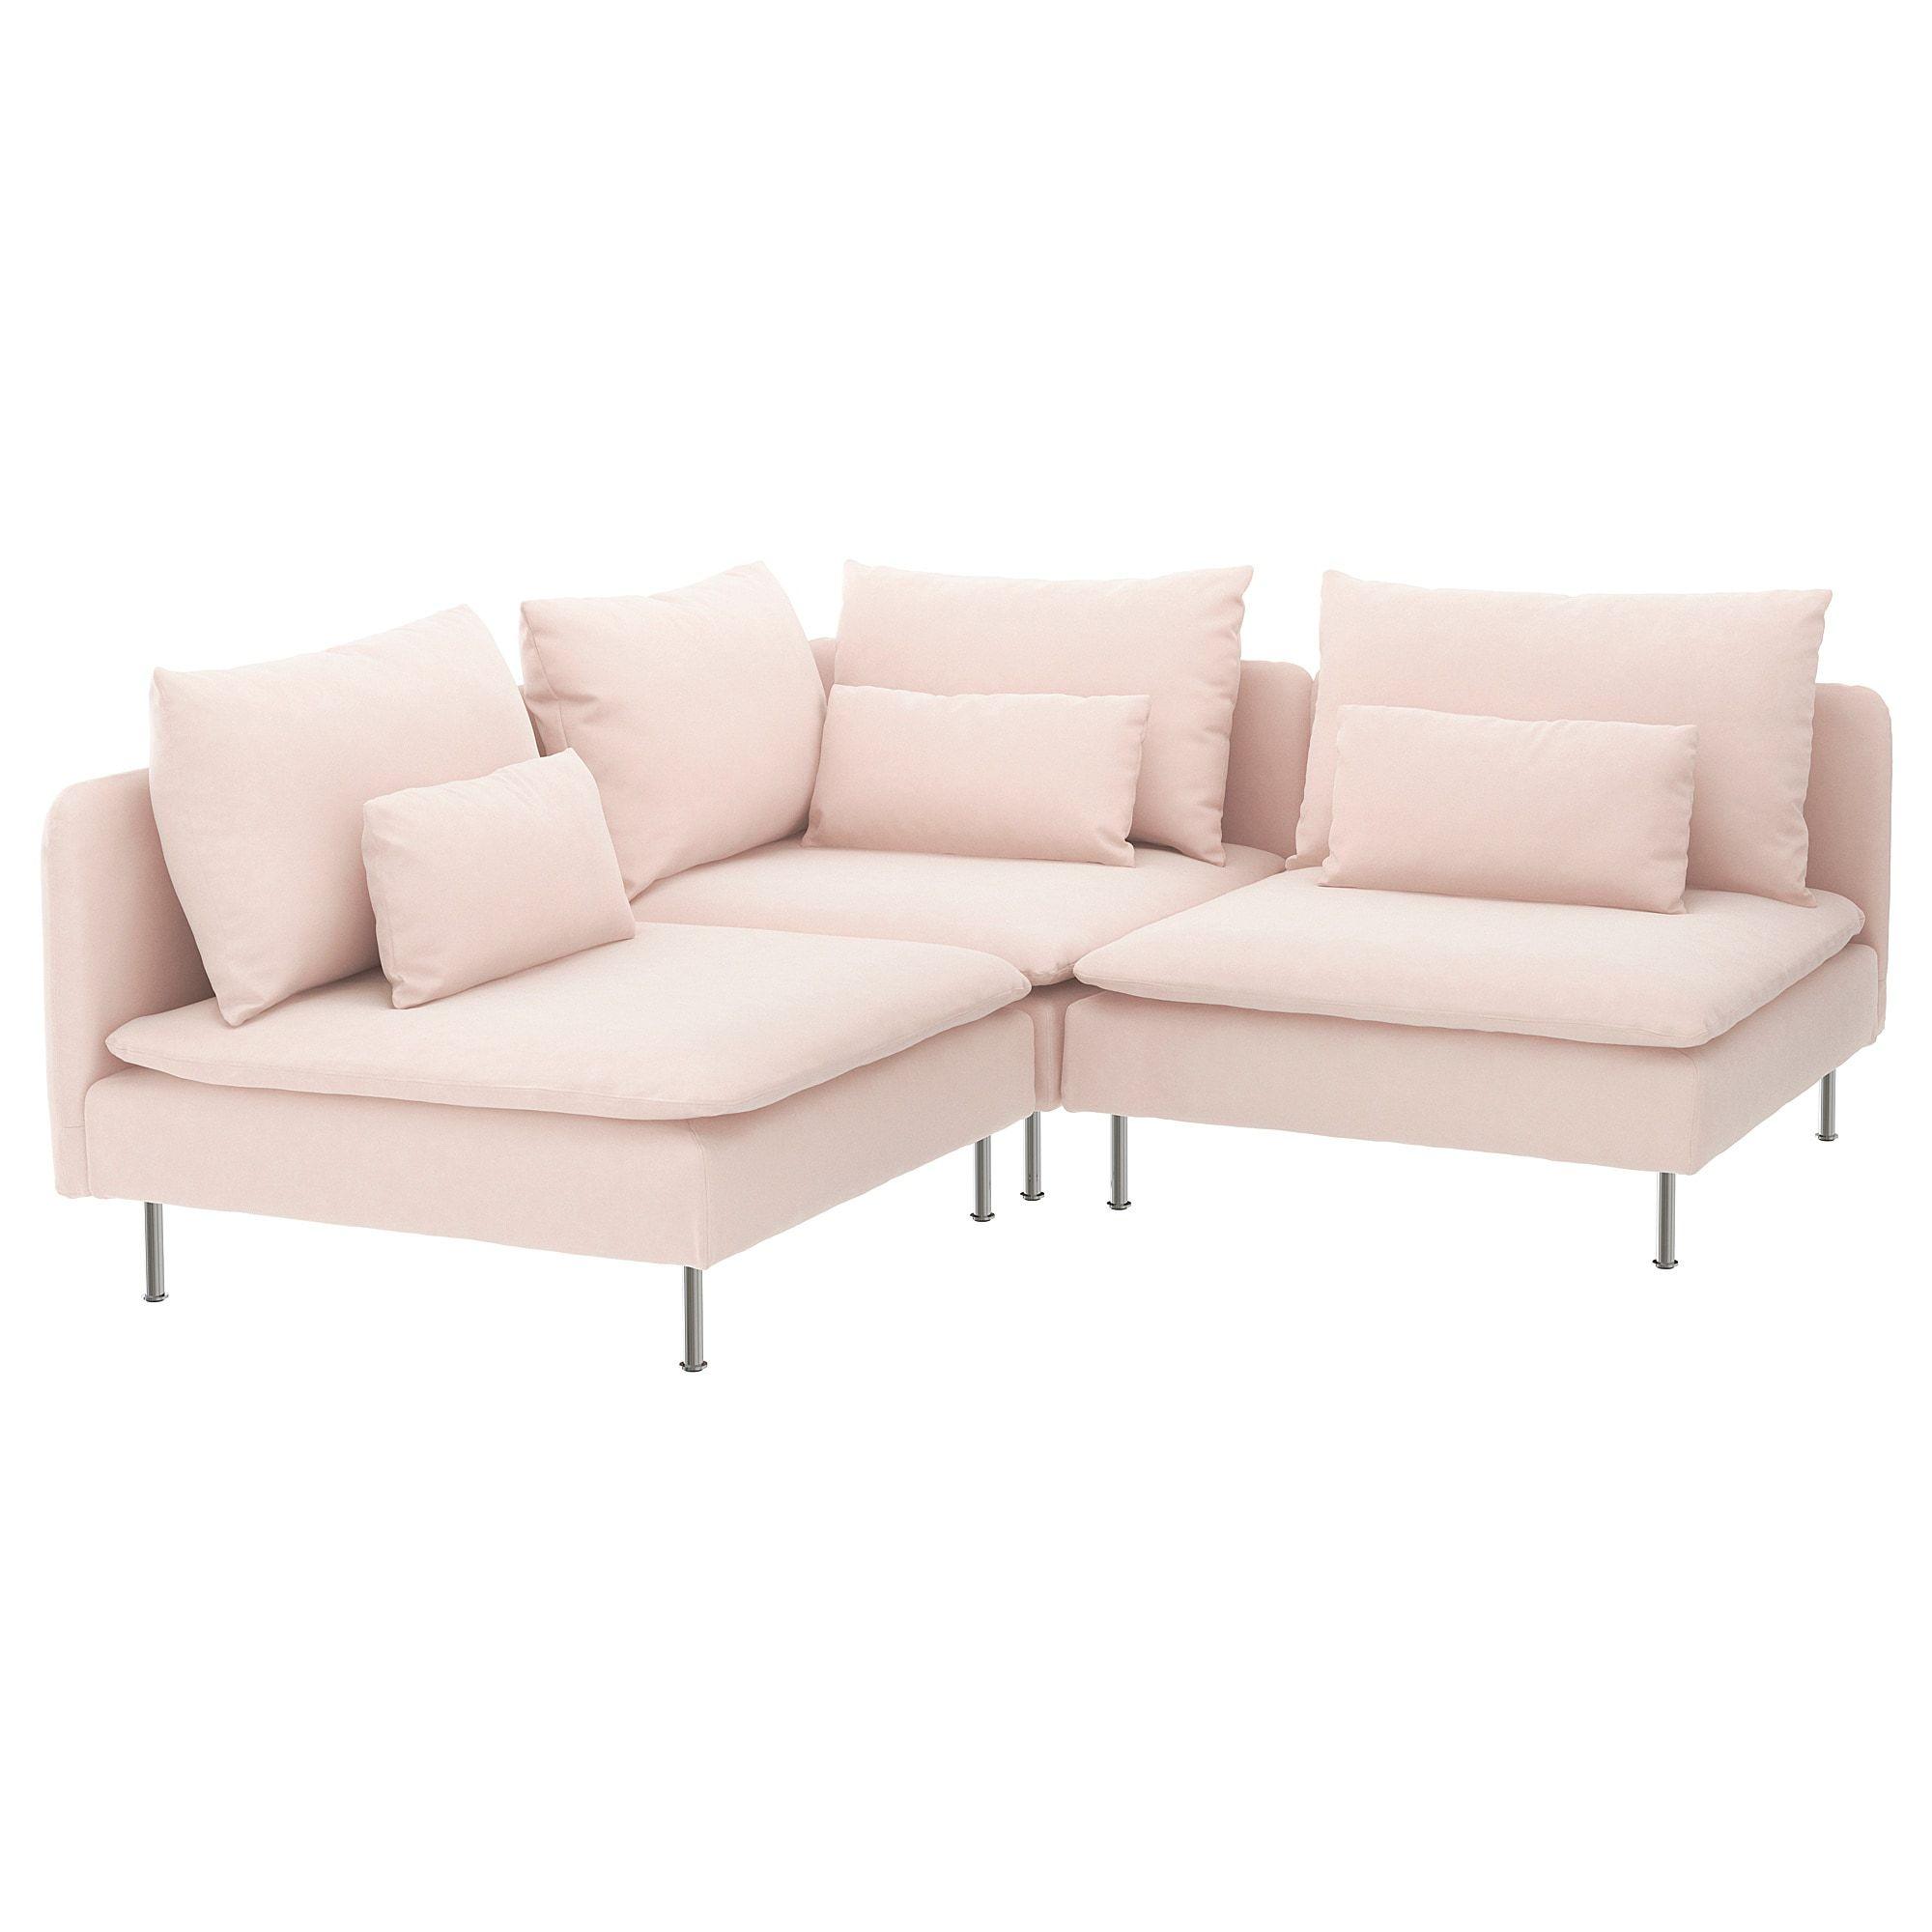 Soderhamn Sectional 3 Seat Corner Samsta Light Pink In 2020 Sofa Pink Couch Corner Sofa